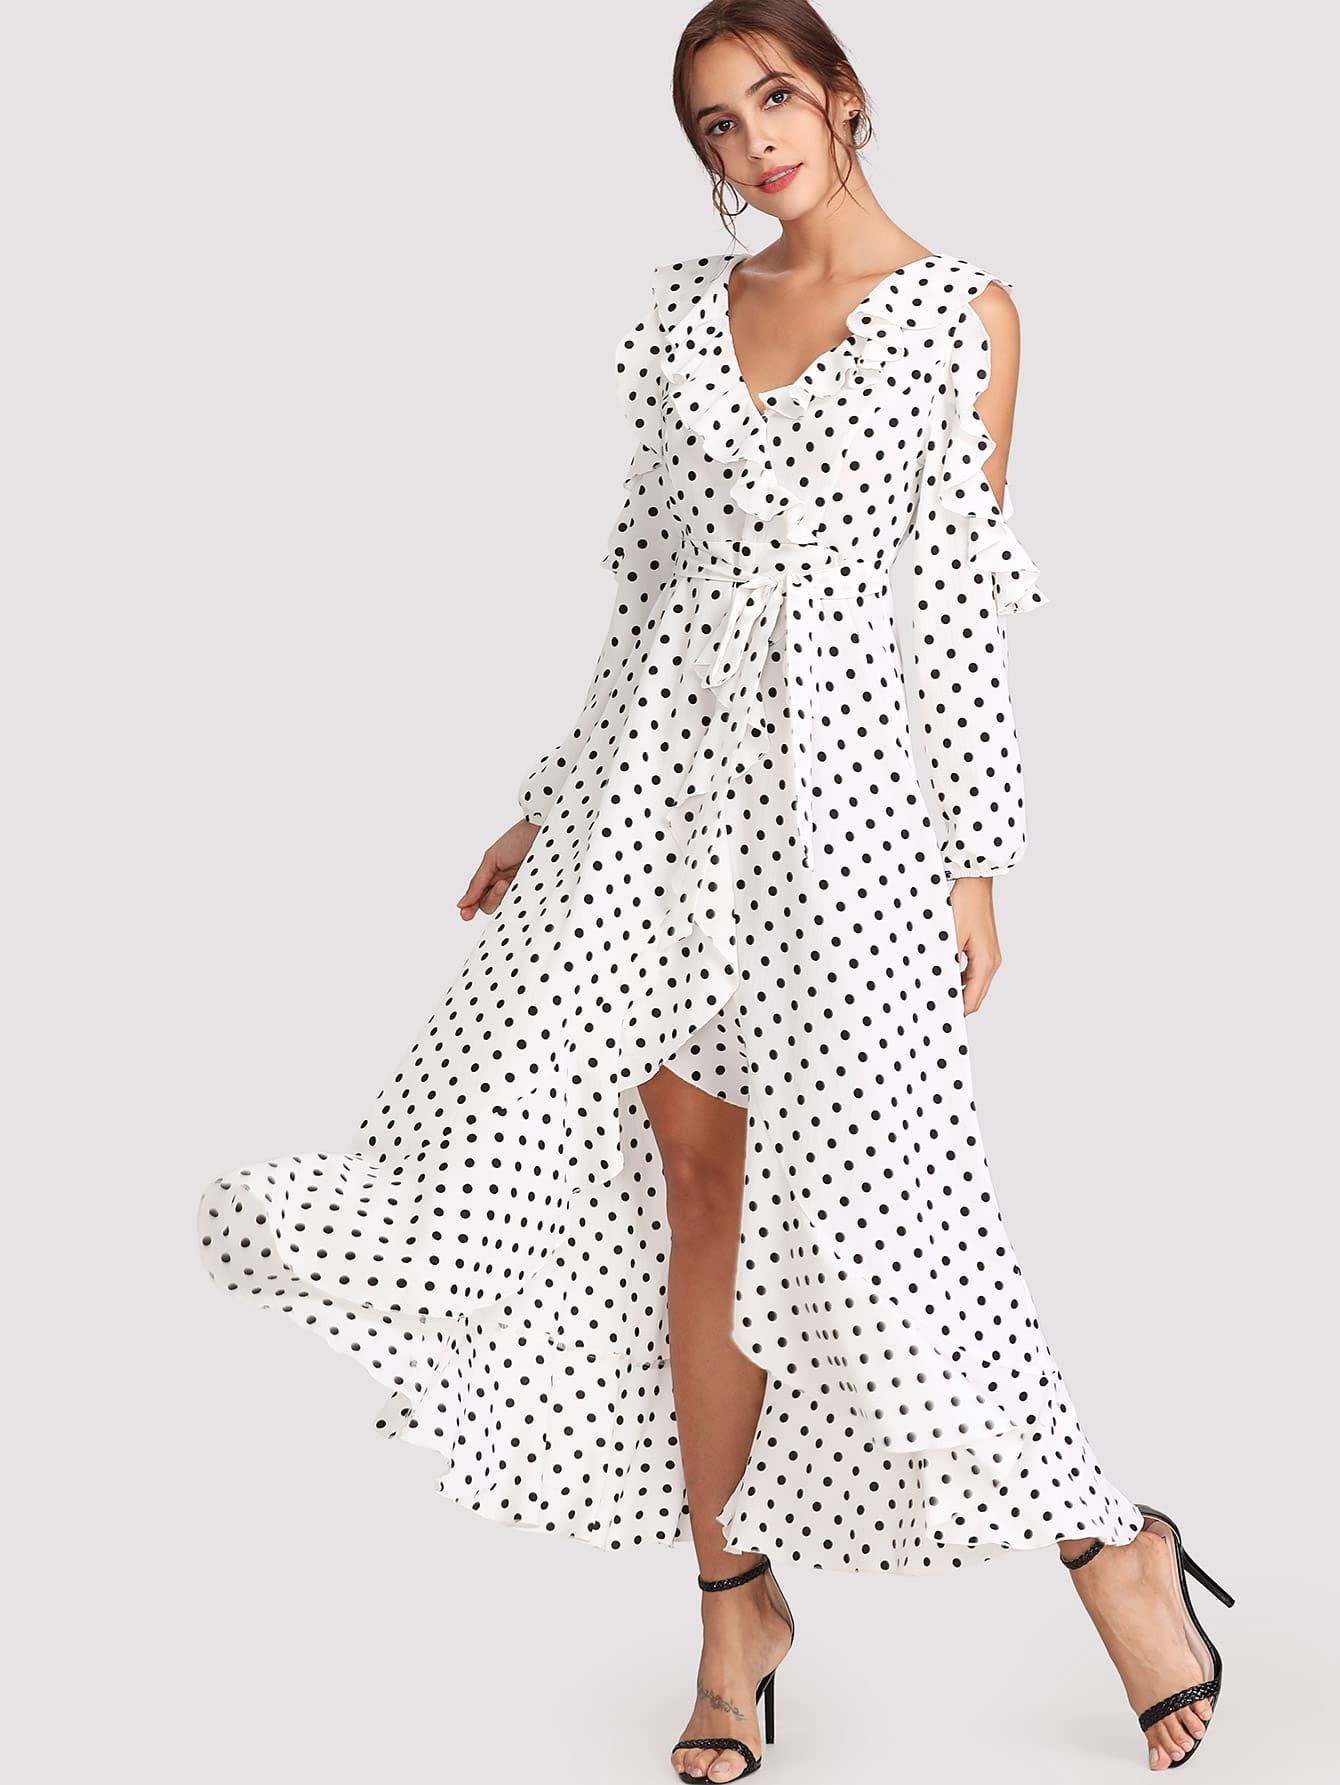 Crisscross Back Ruffle Trim Asymmetrical Polka Dot Dress ruffle trim belted polka dot dress